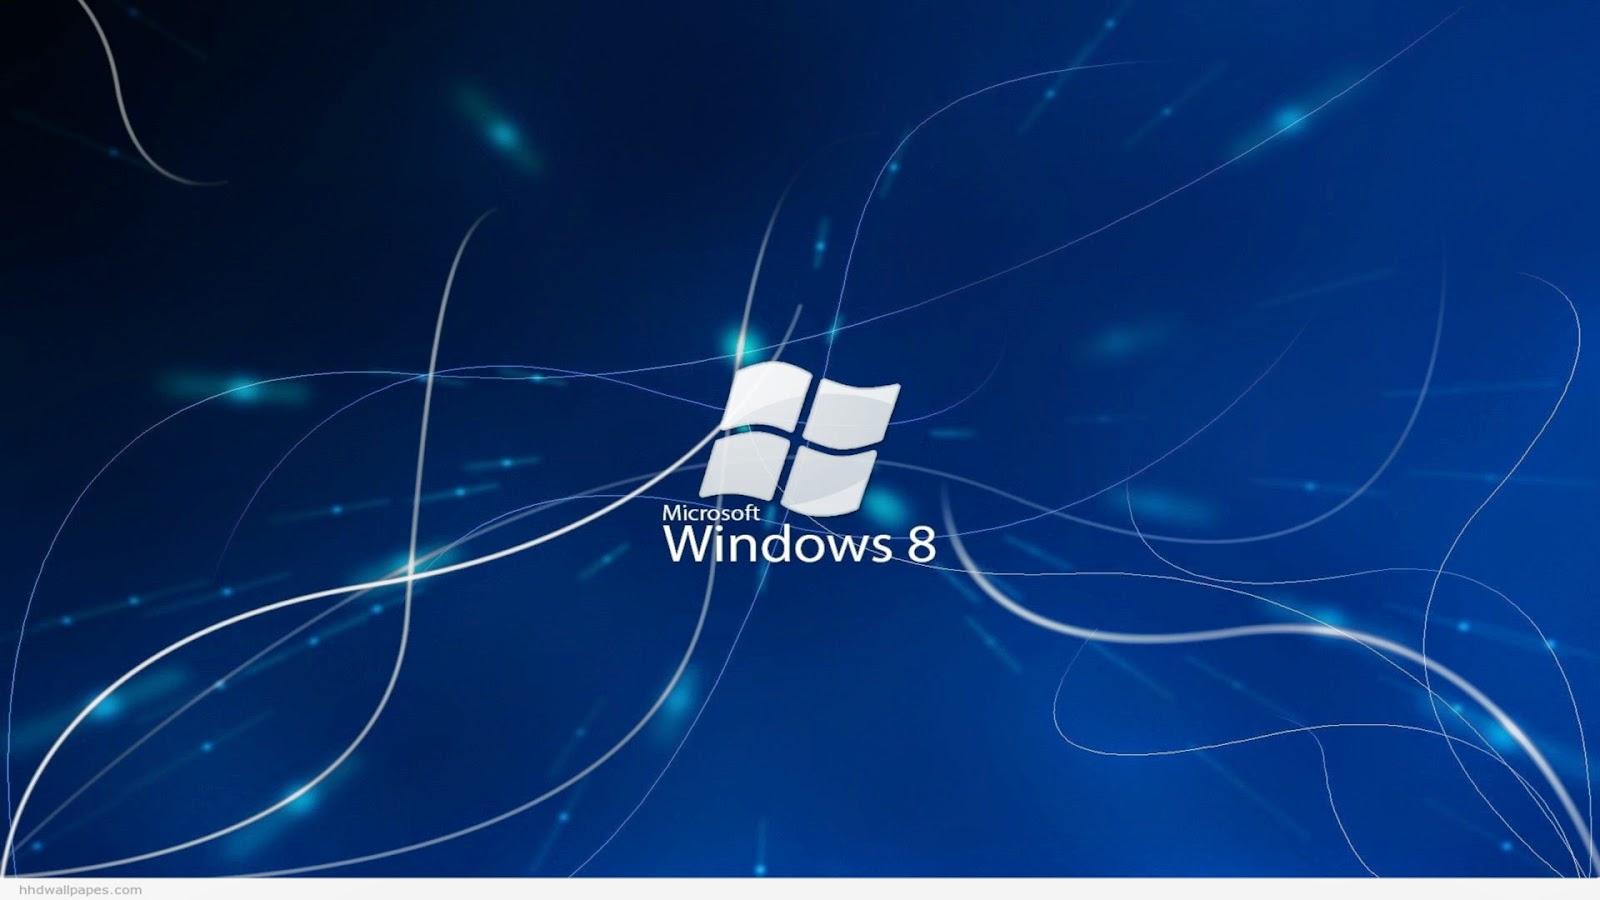 windows-8-custom-boot-load-image-blue-BG-white-text-full-HD-1080p-free-download.jpg